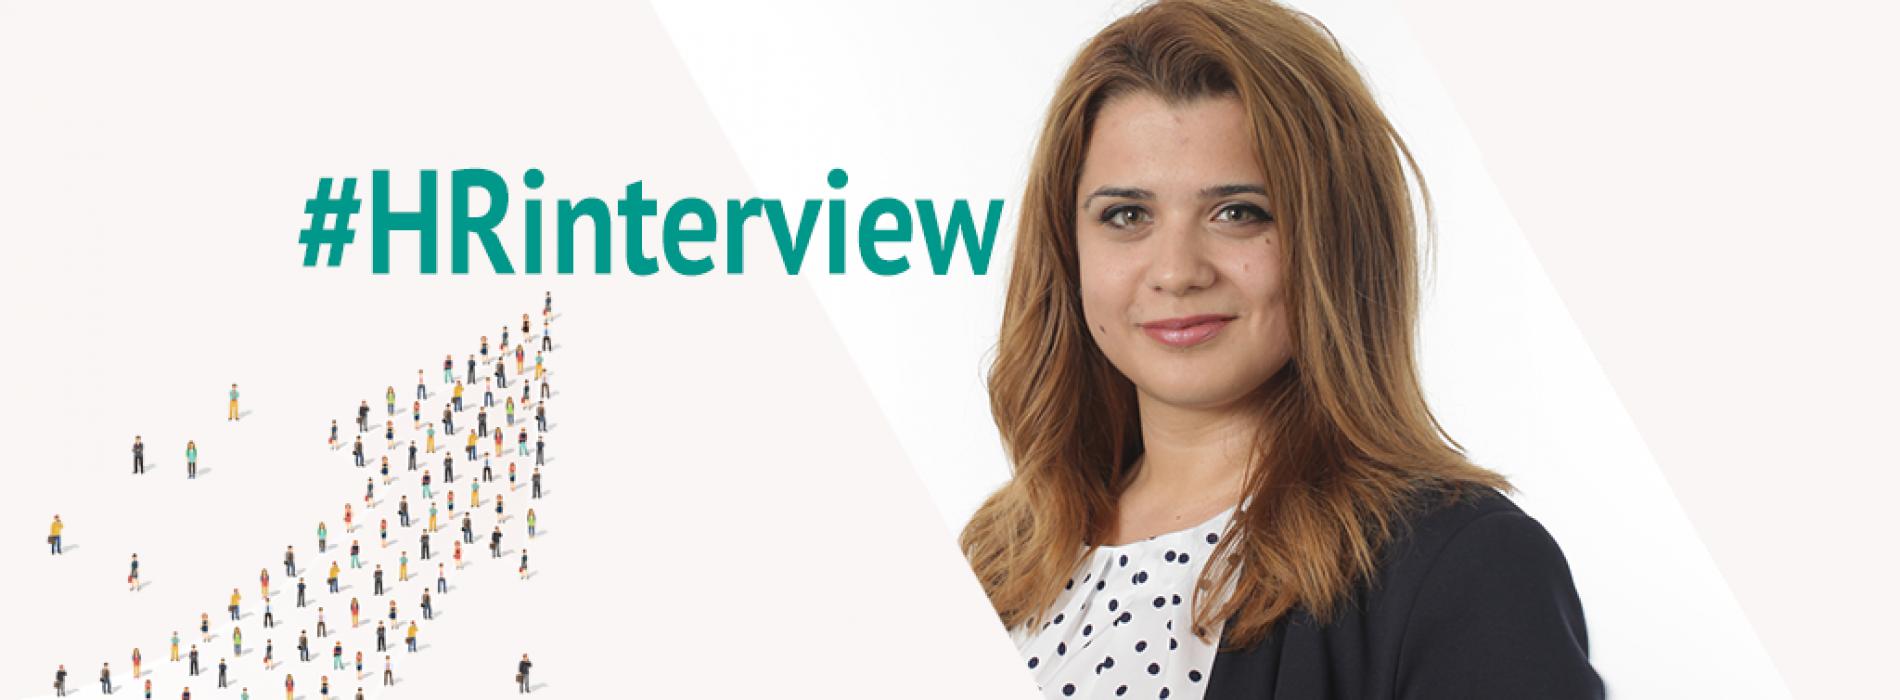 #HRinterview: Силвия Петрова, Senior Specialist Recruitment and Employer Branding, TBI Bank